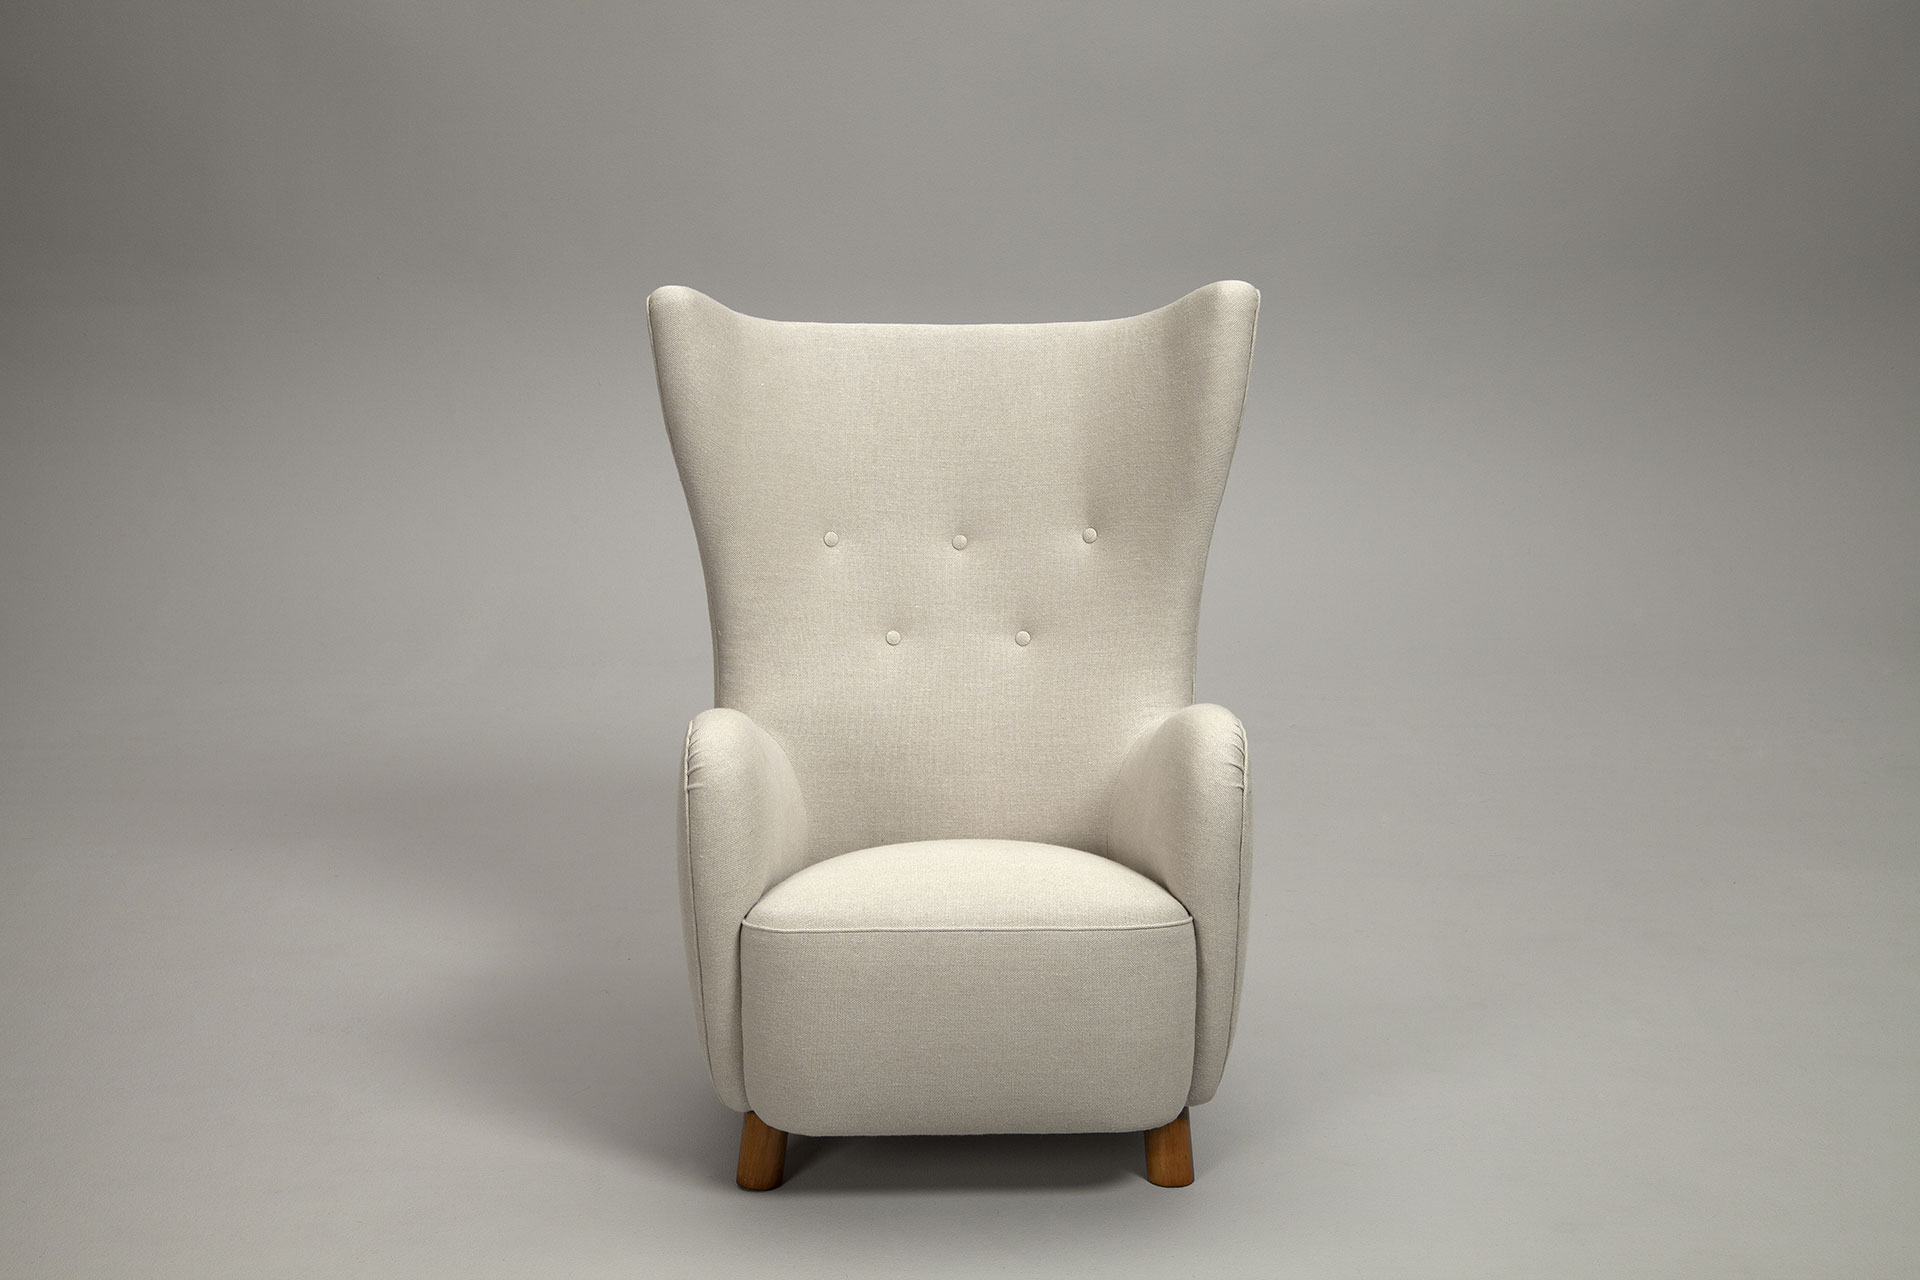 Jacksons Pair of Wing Chairs Mogens Lassen